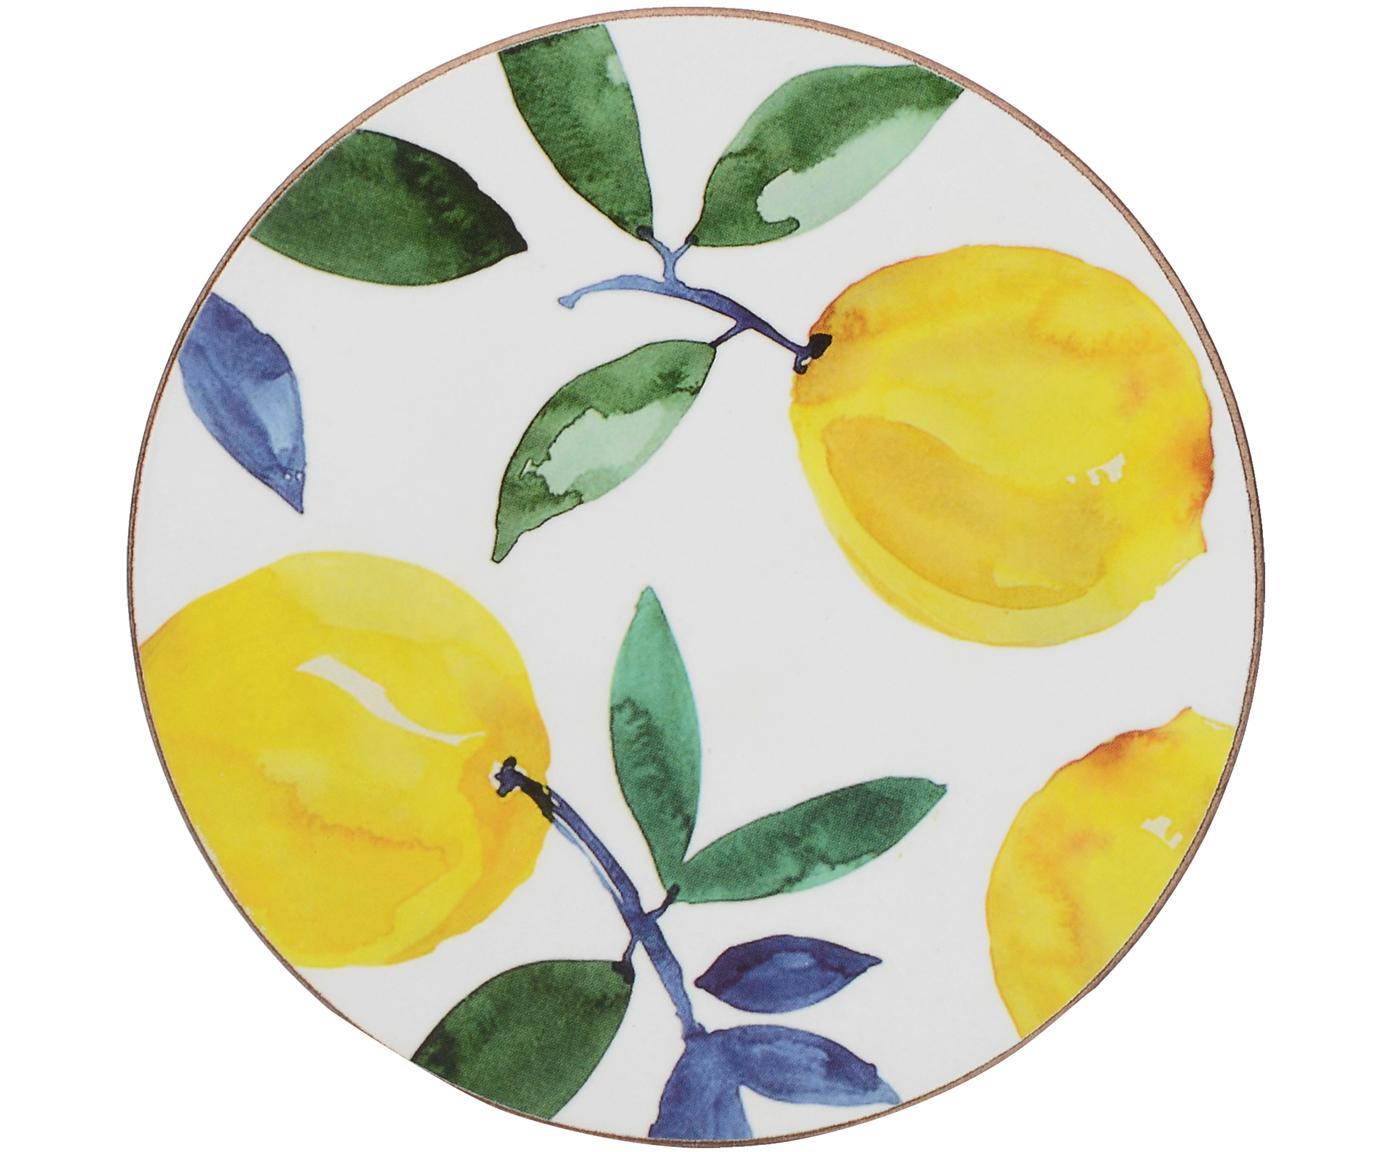 Posavasos Lemons, 4uds., Corcho, Blanco, amarillo, verde, Ø 12 cm